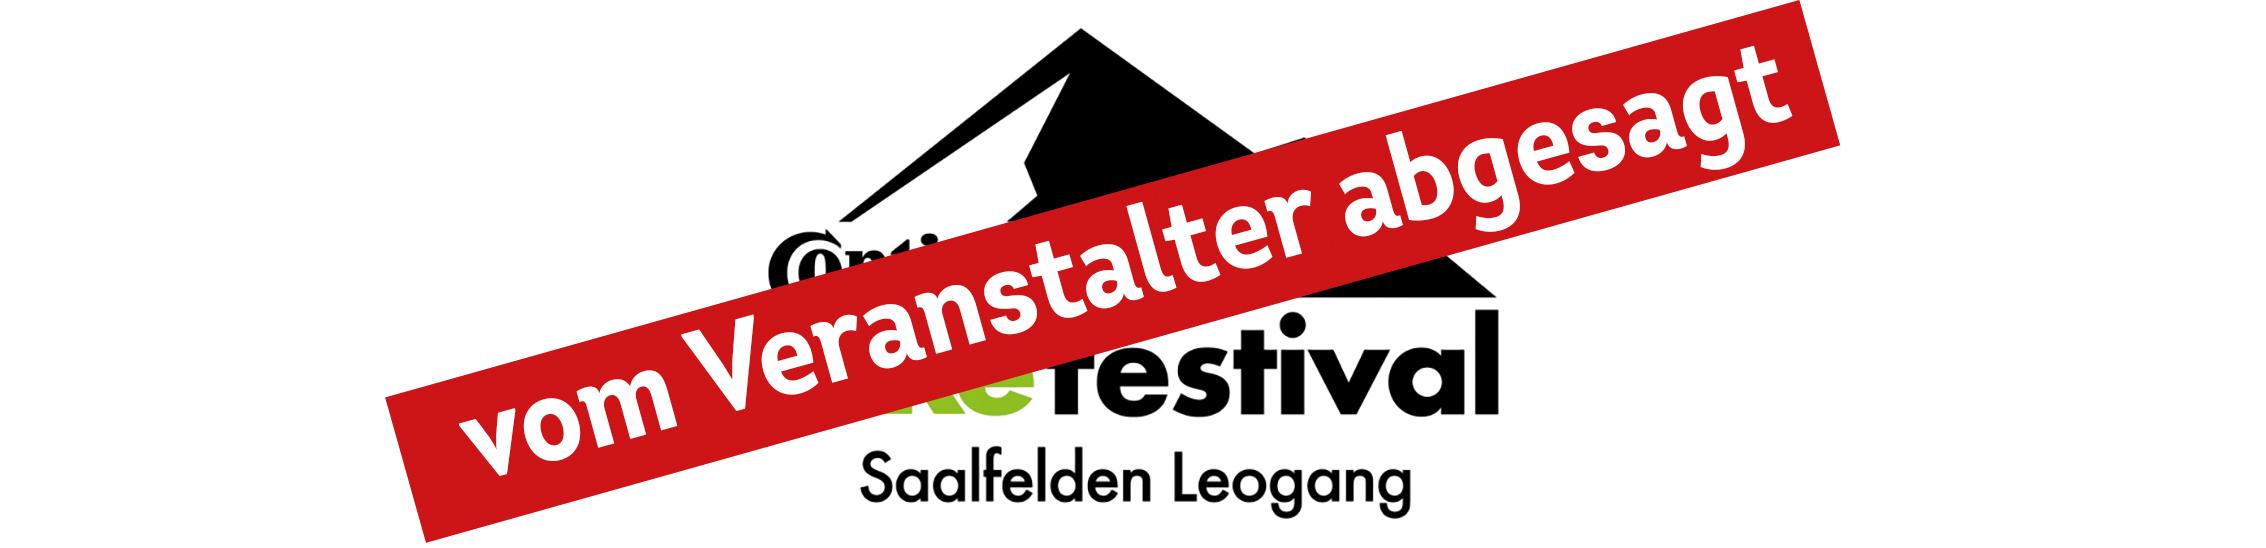 Bikefestival Saalfelden Leogang